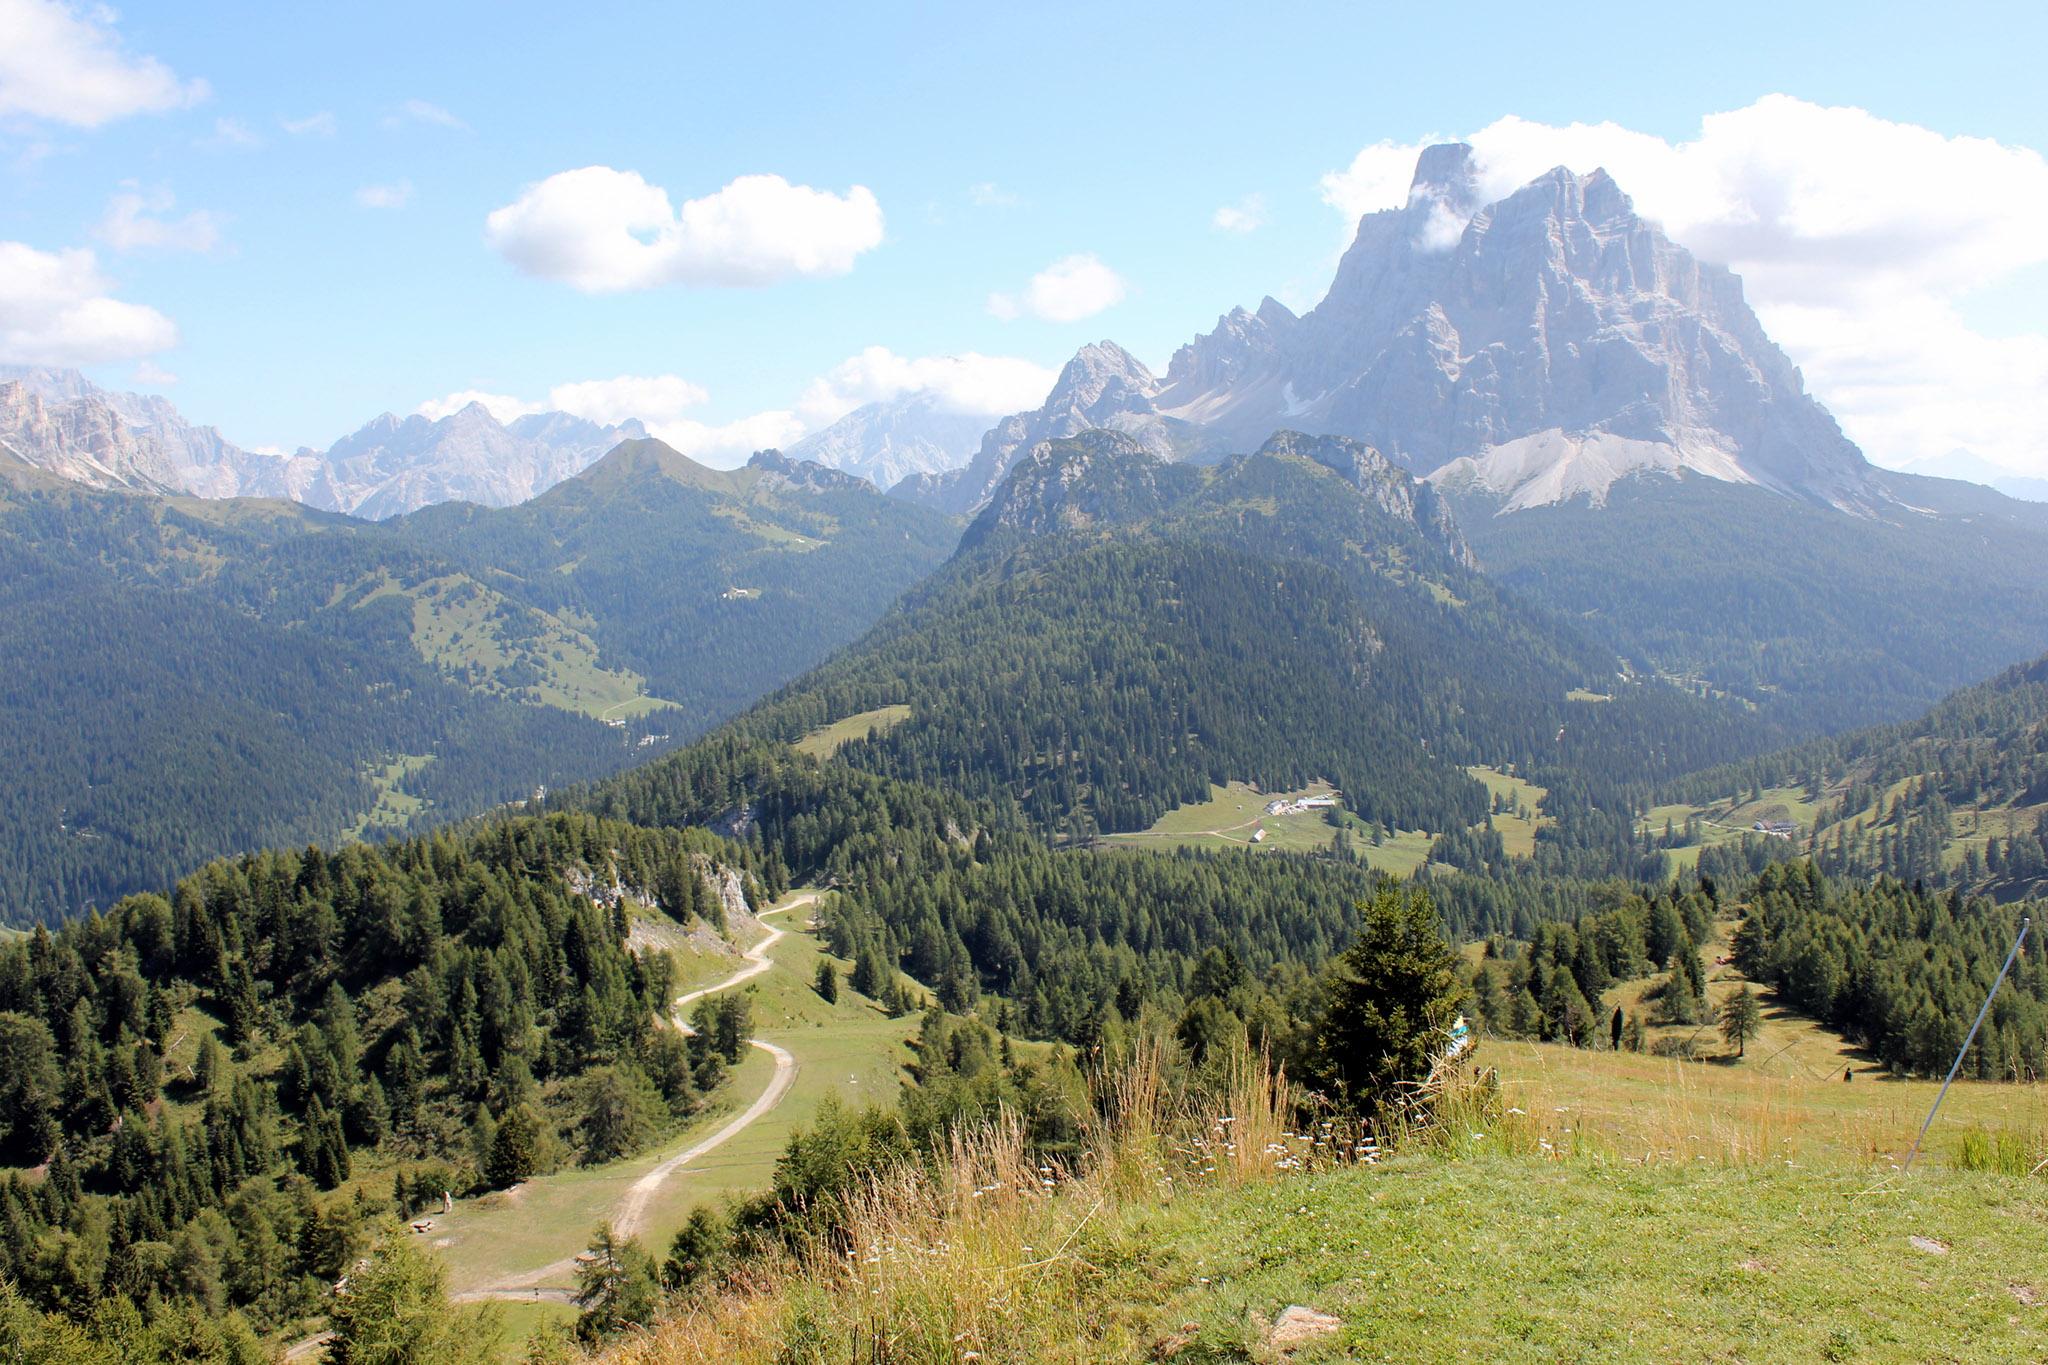 Run Italy - Dolomites Adventure - Join us for an Italian running adventure through the famous Dolomites.